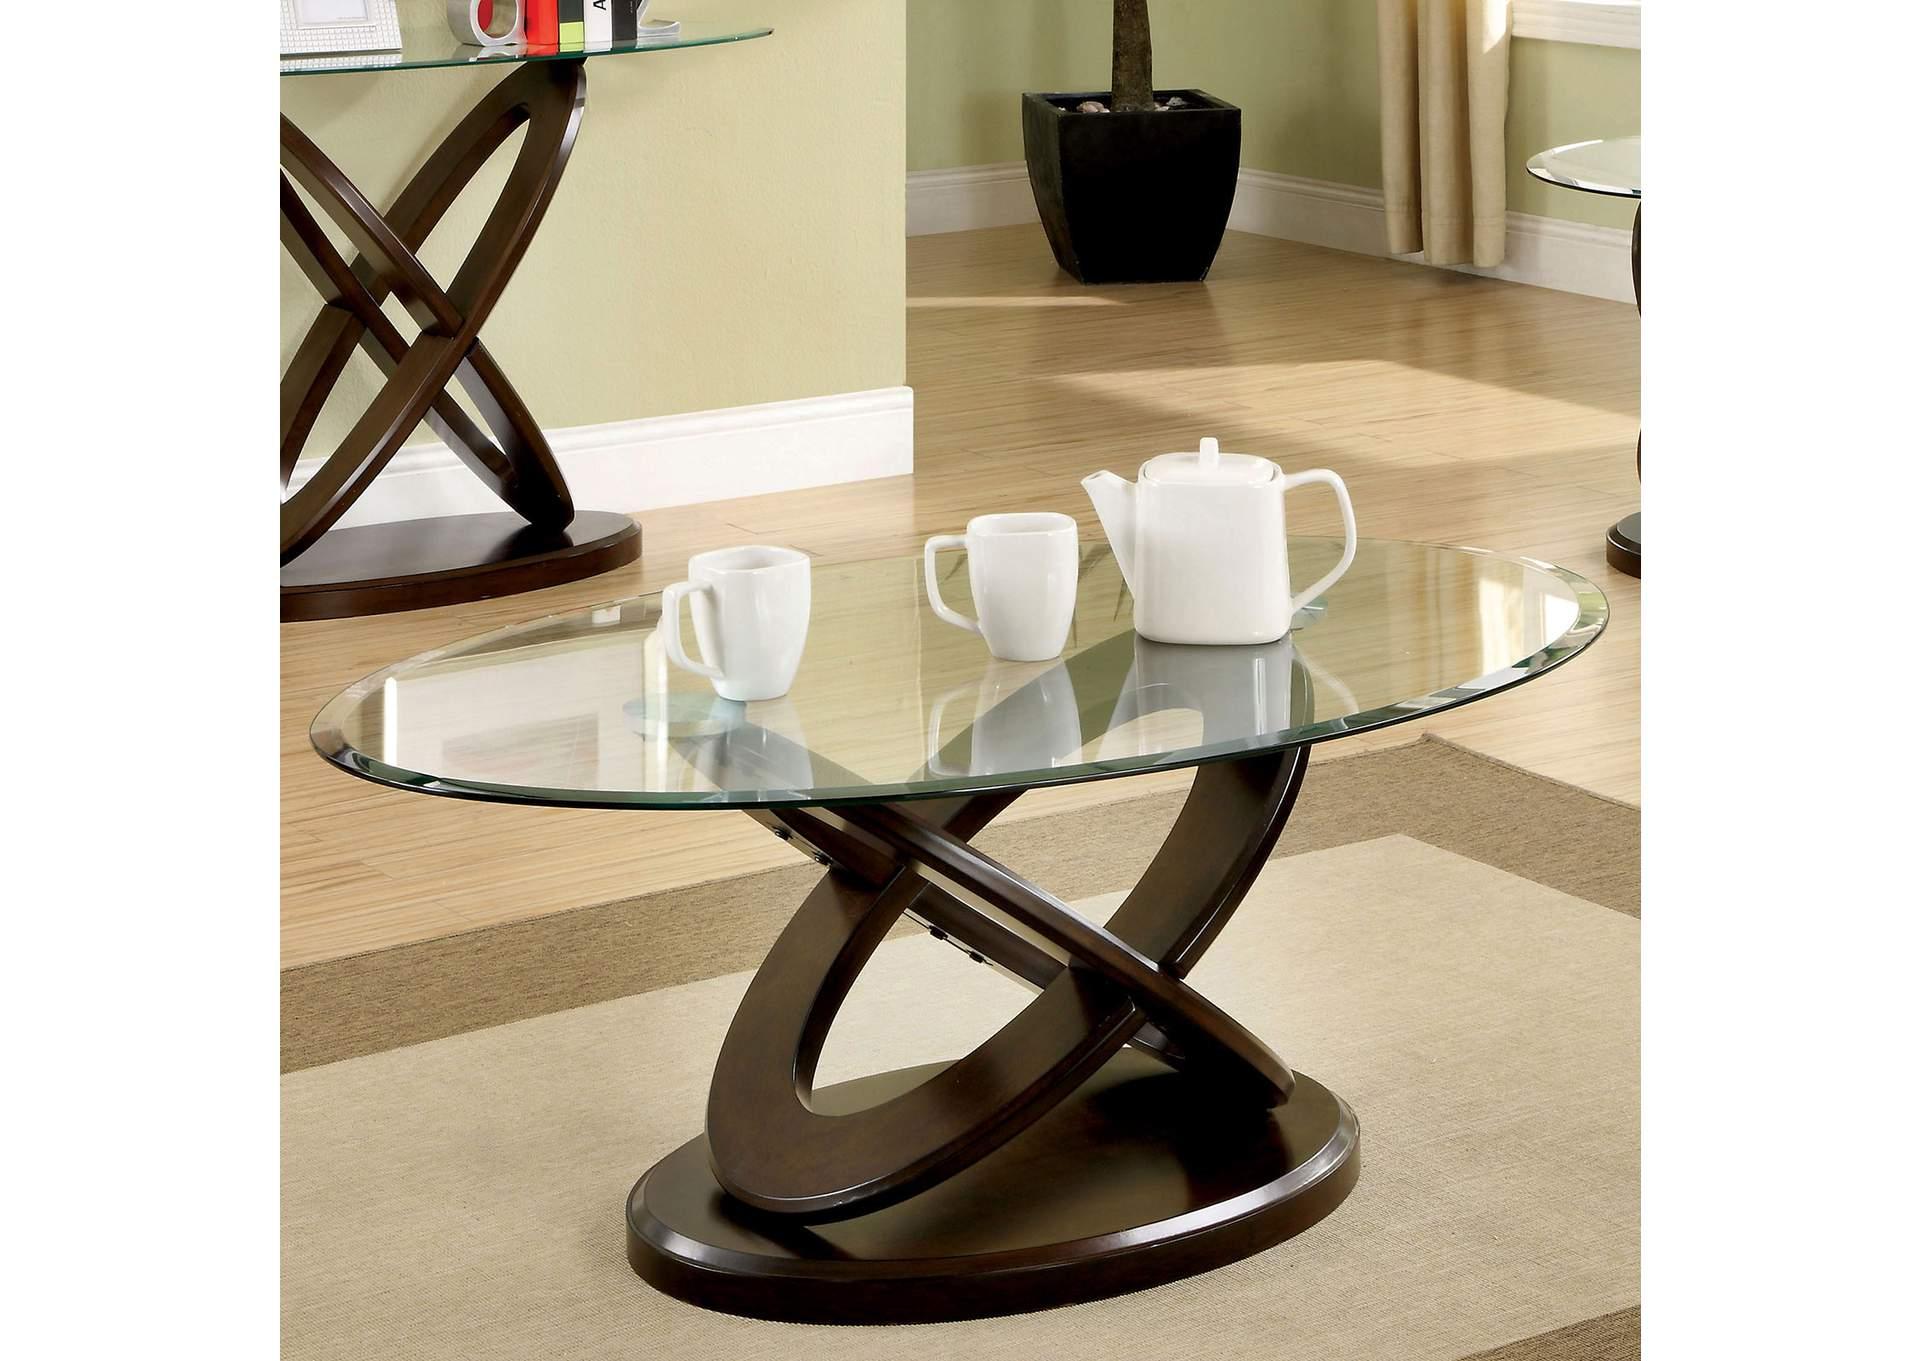 Atwood Dark Walnut Oval Coffee Table Best Buy Furniture And Mattress [ 1361 x 1920 Pixel ]